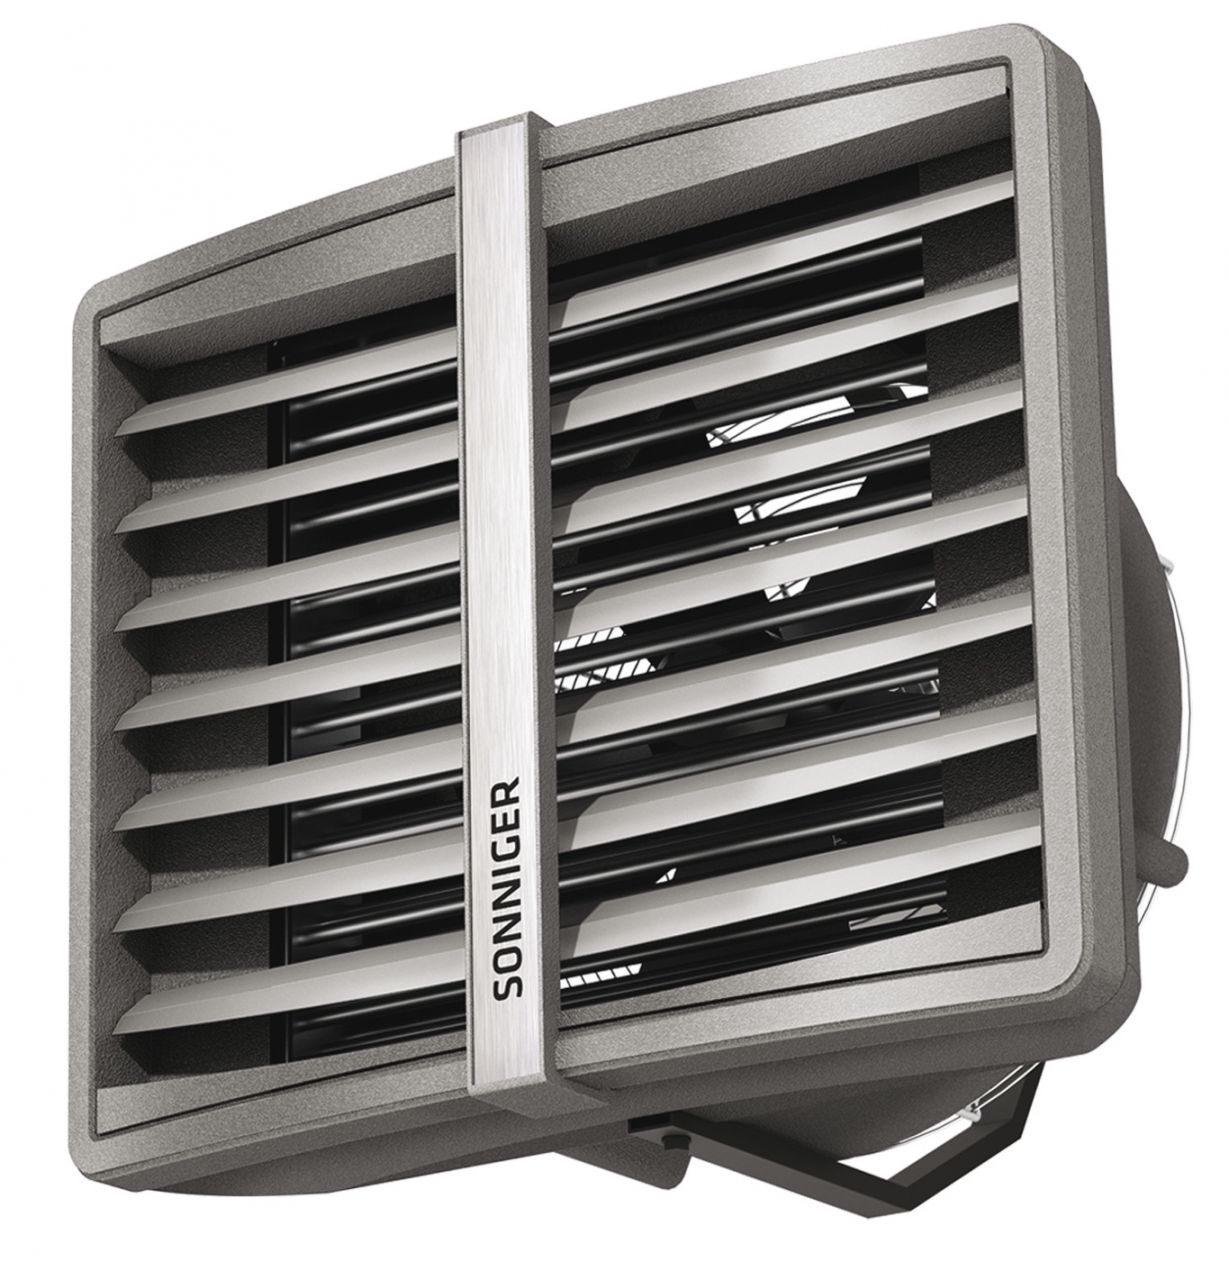 HEATER R3 termoventilátor AC motorral , Vmax=4400m3/h 50-70 kW